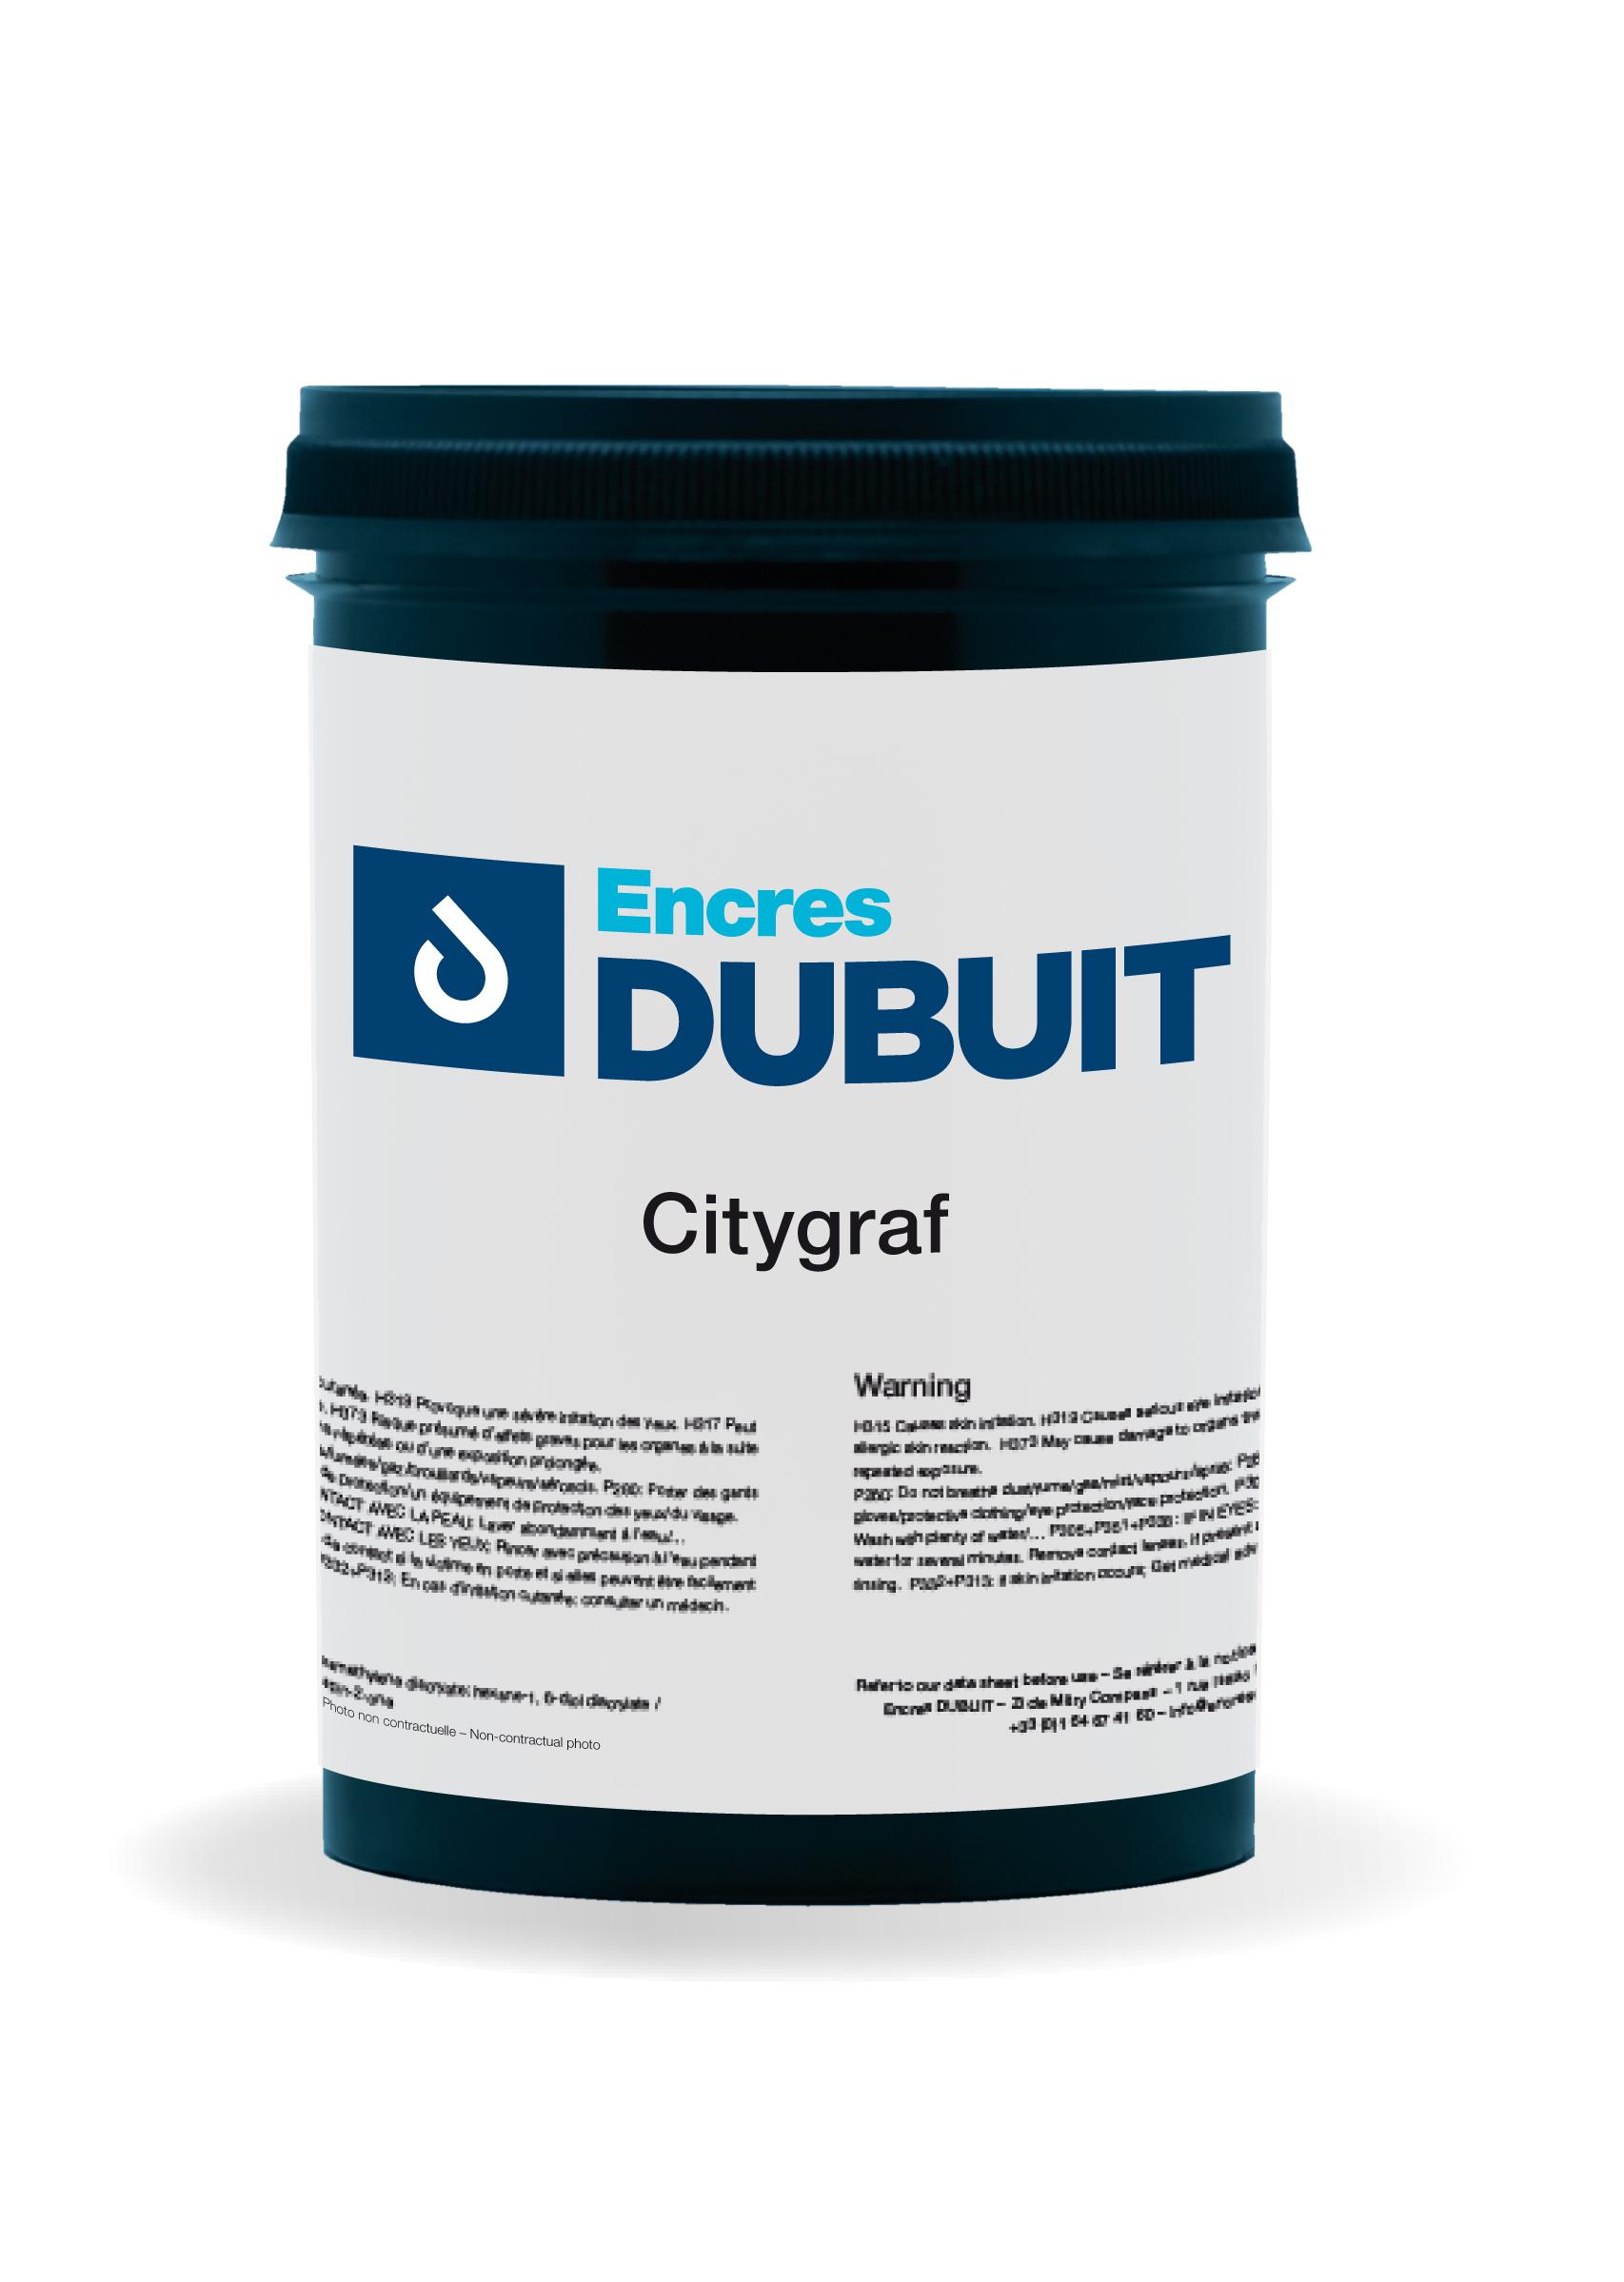 Citygraf Encres DUBUIT